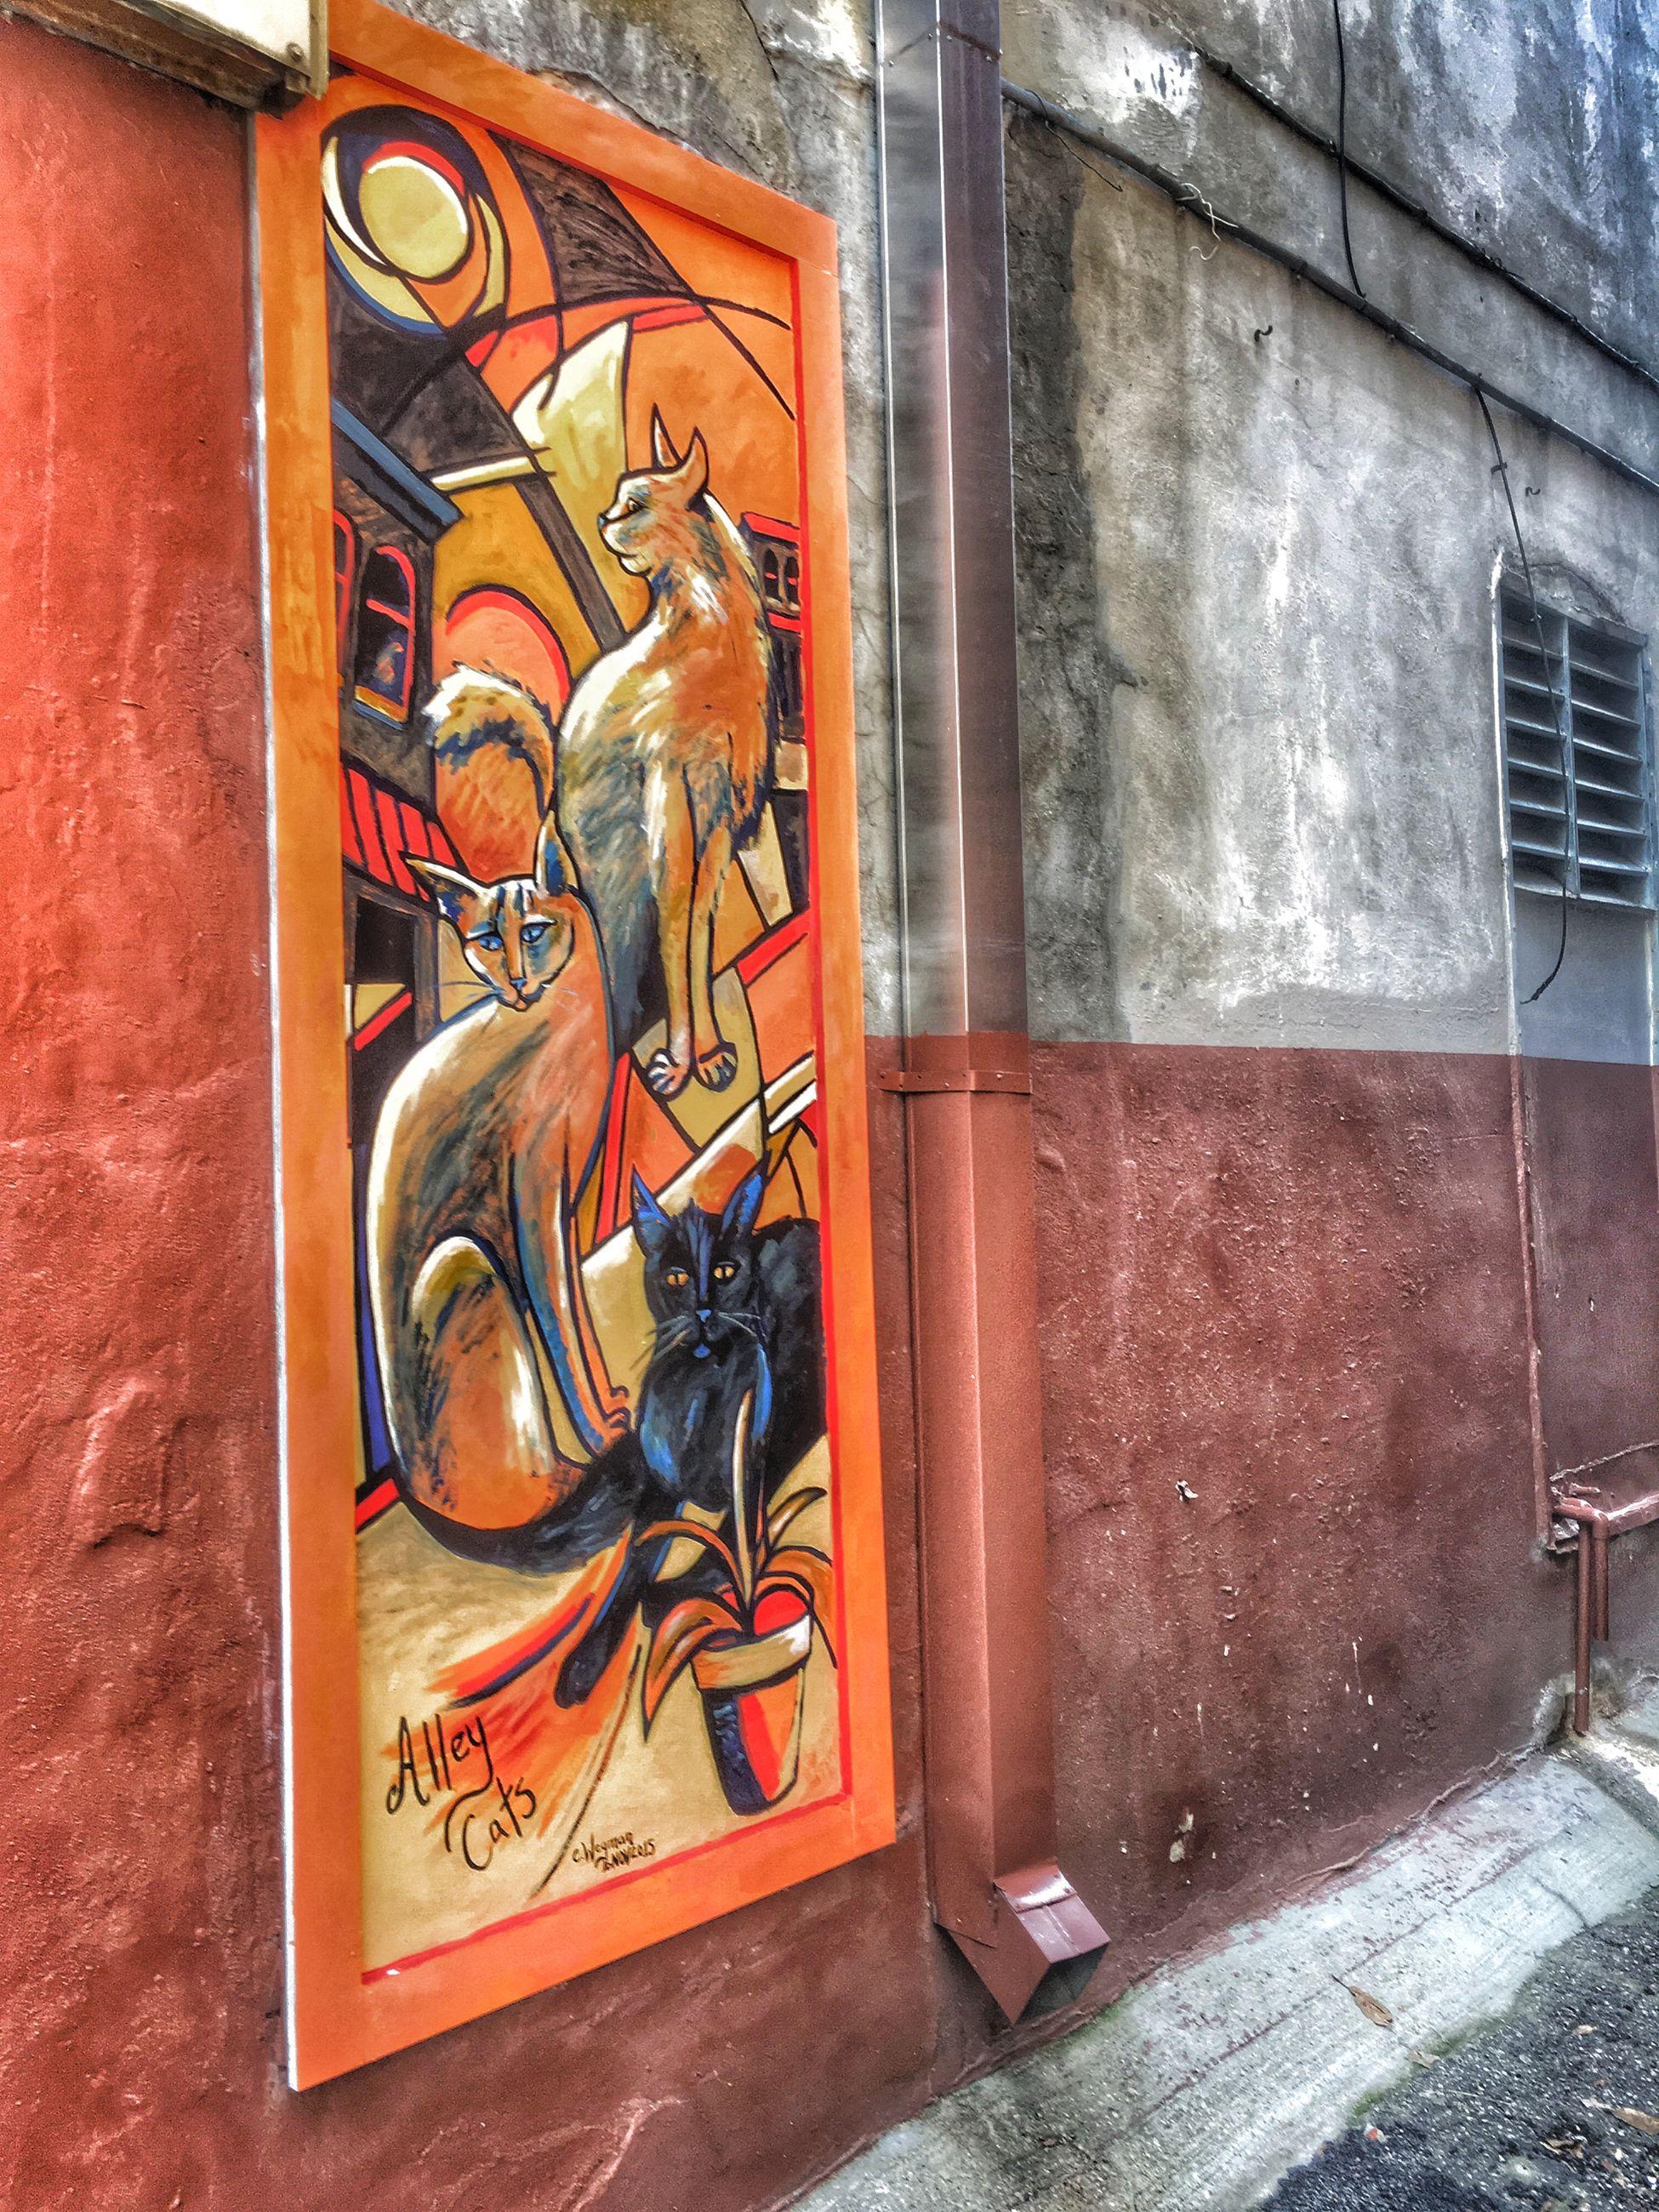 art, art and craft, creativity, human representation, graffiti, wall - building feature, statue, sculpture, building exterior, built structure, architecture, animal representation, wall, brick wall, day, outdoors, door, carving - craft product